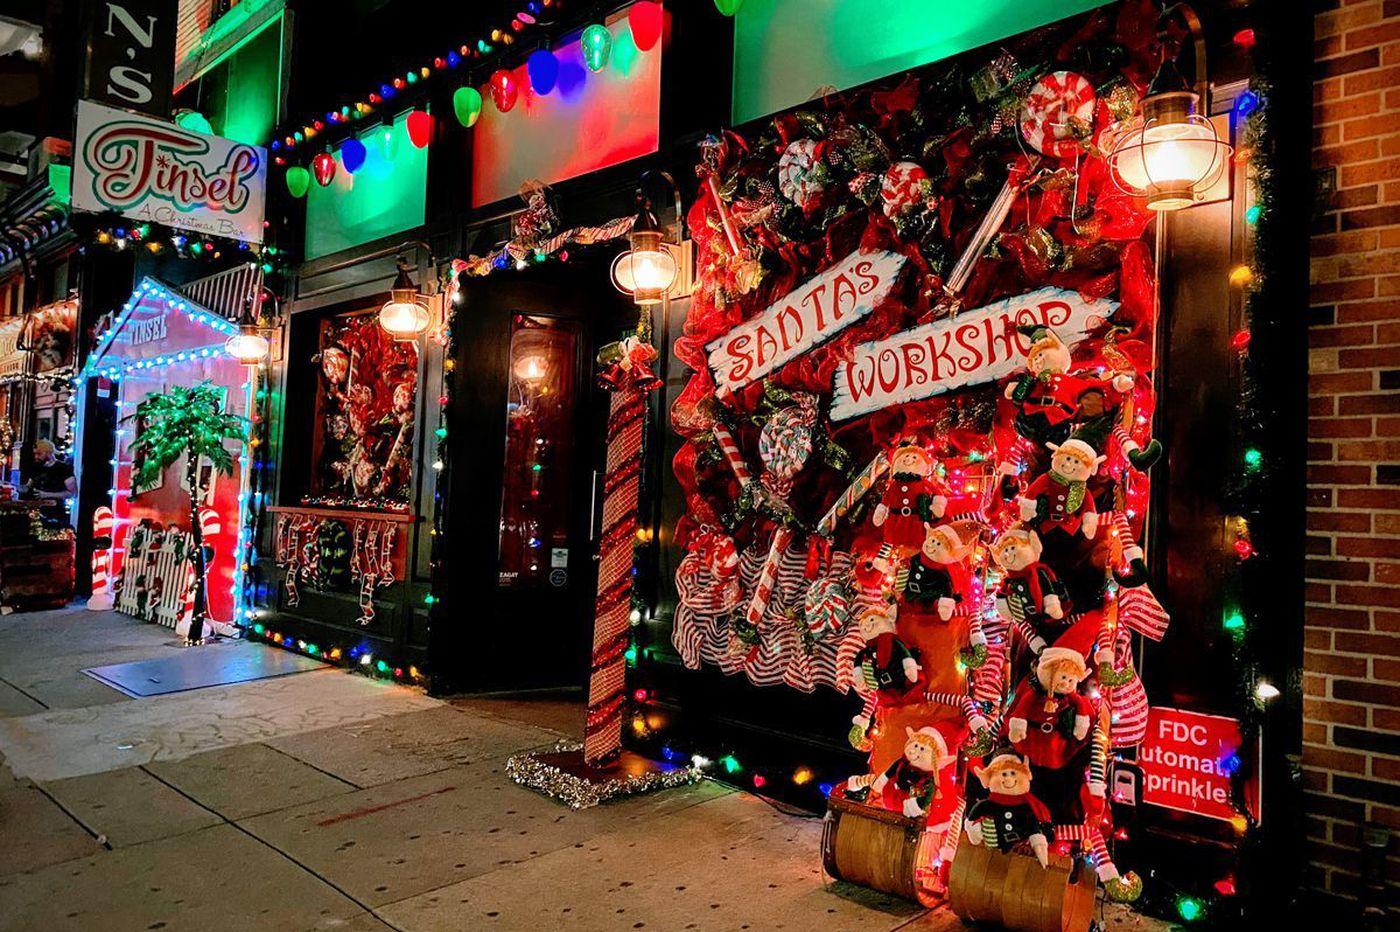 Seasonal bar Tinsel returns to Midtown Village for Christmas in July